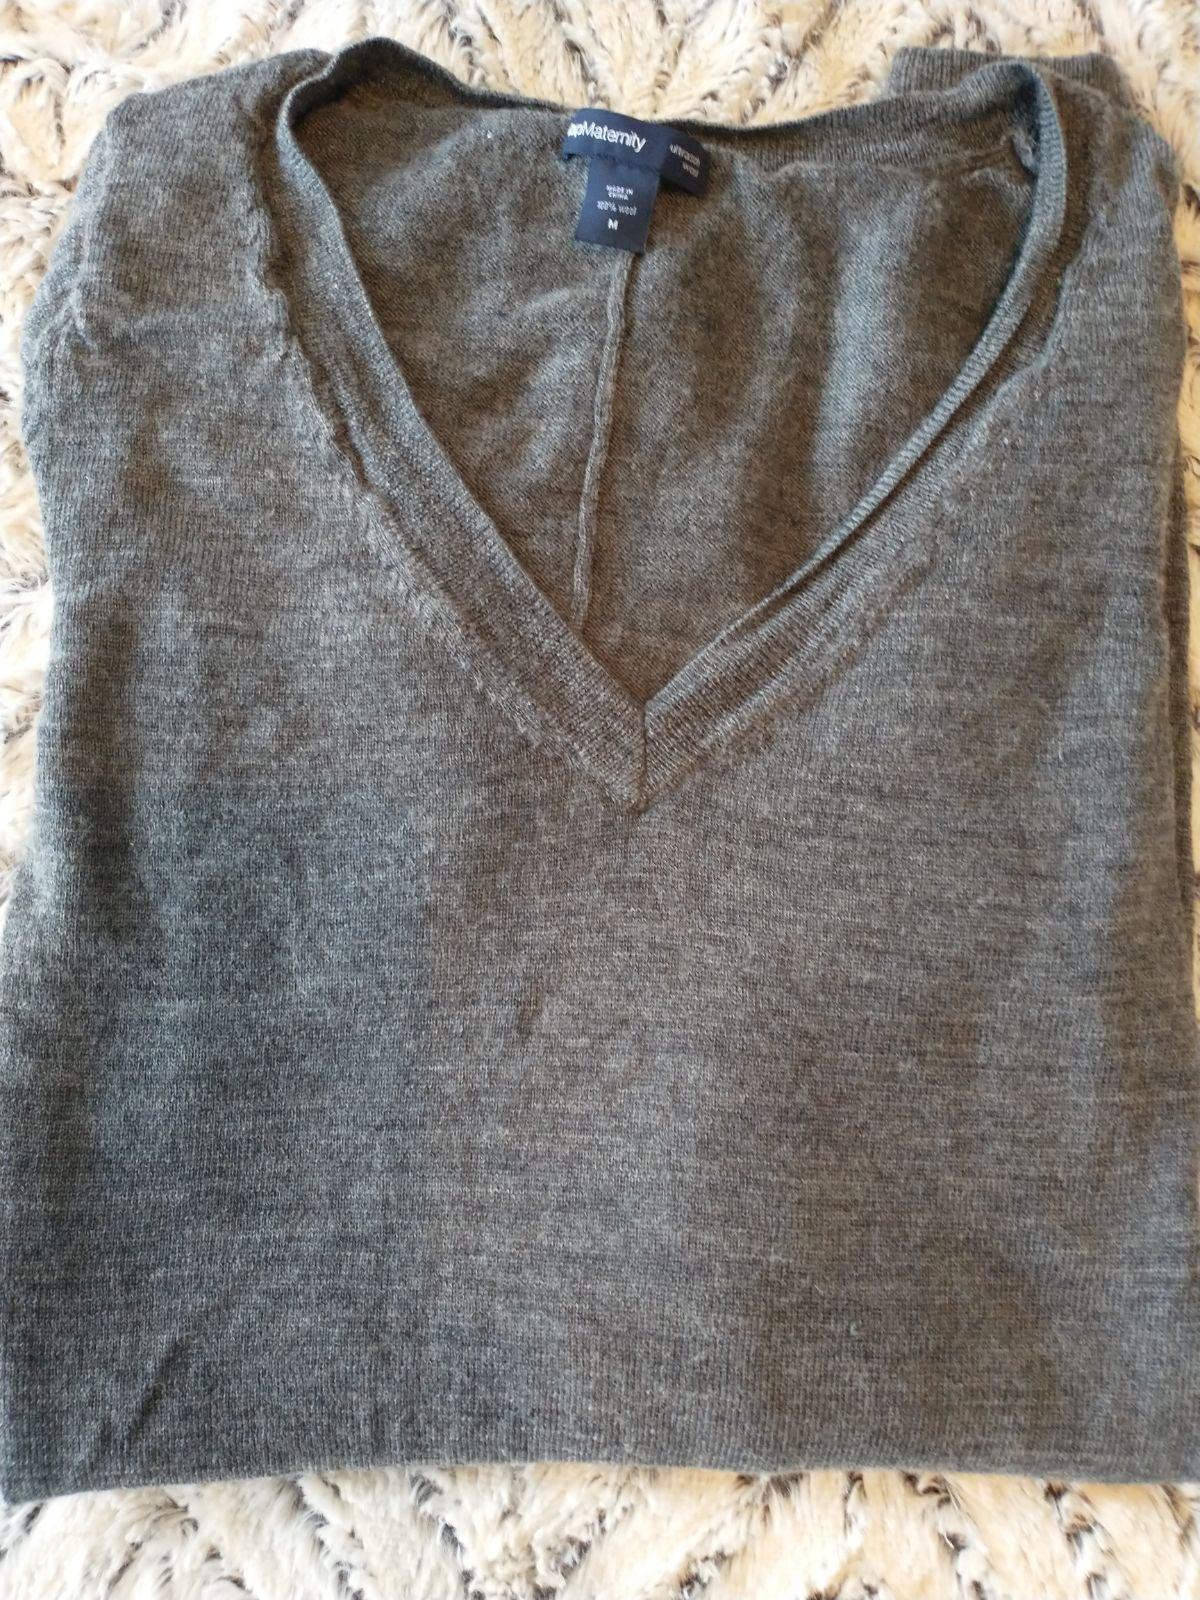 Gap maternity shirt, size M